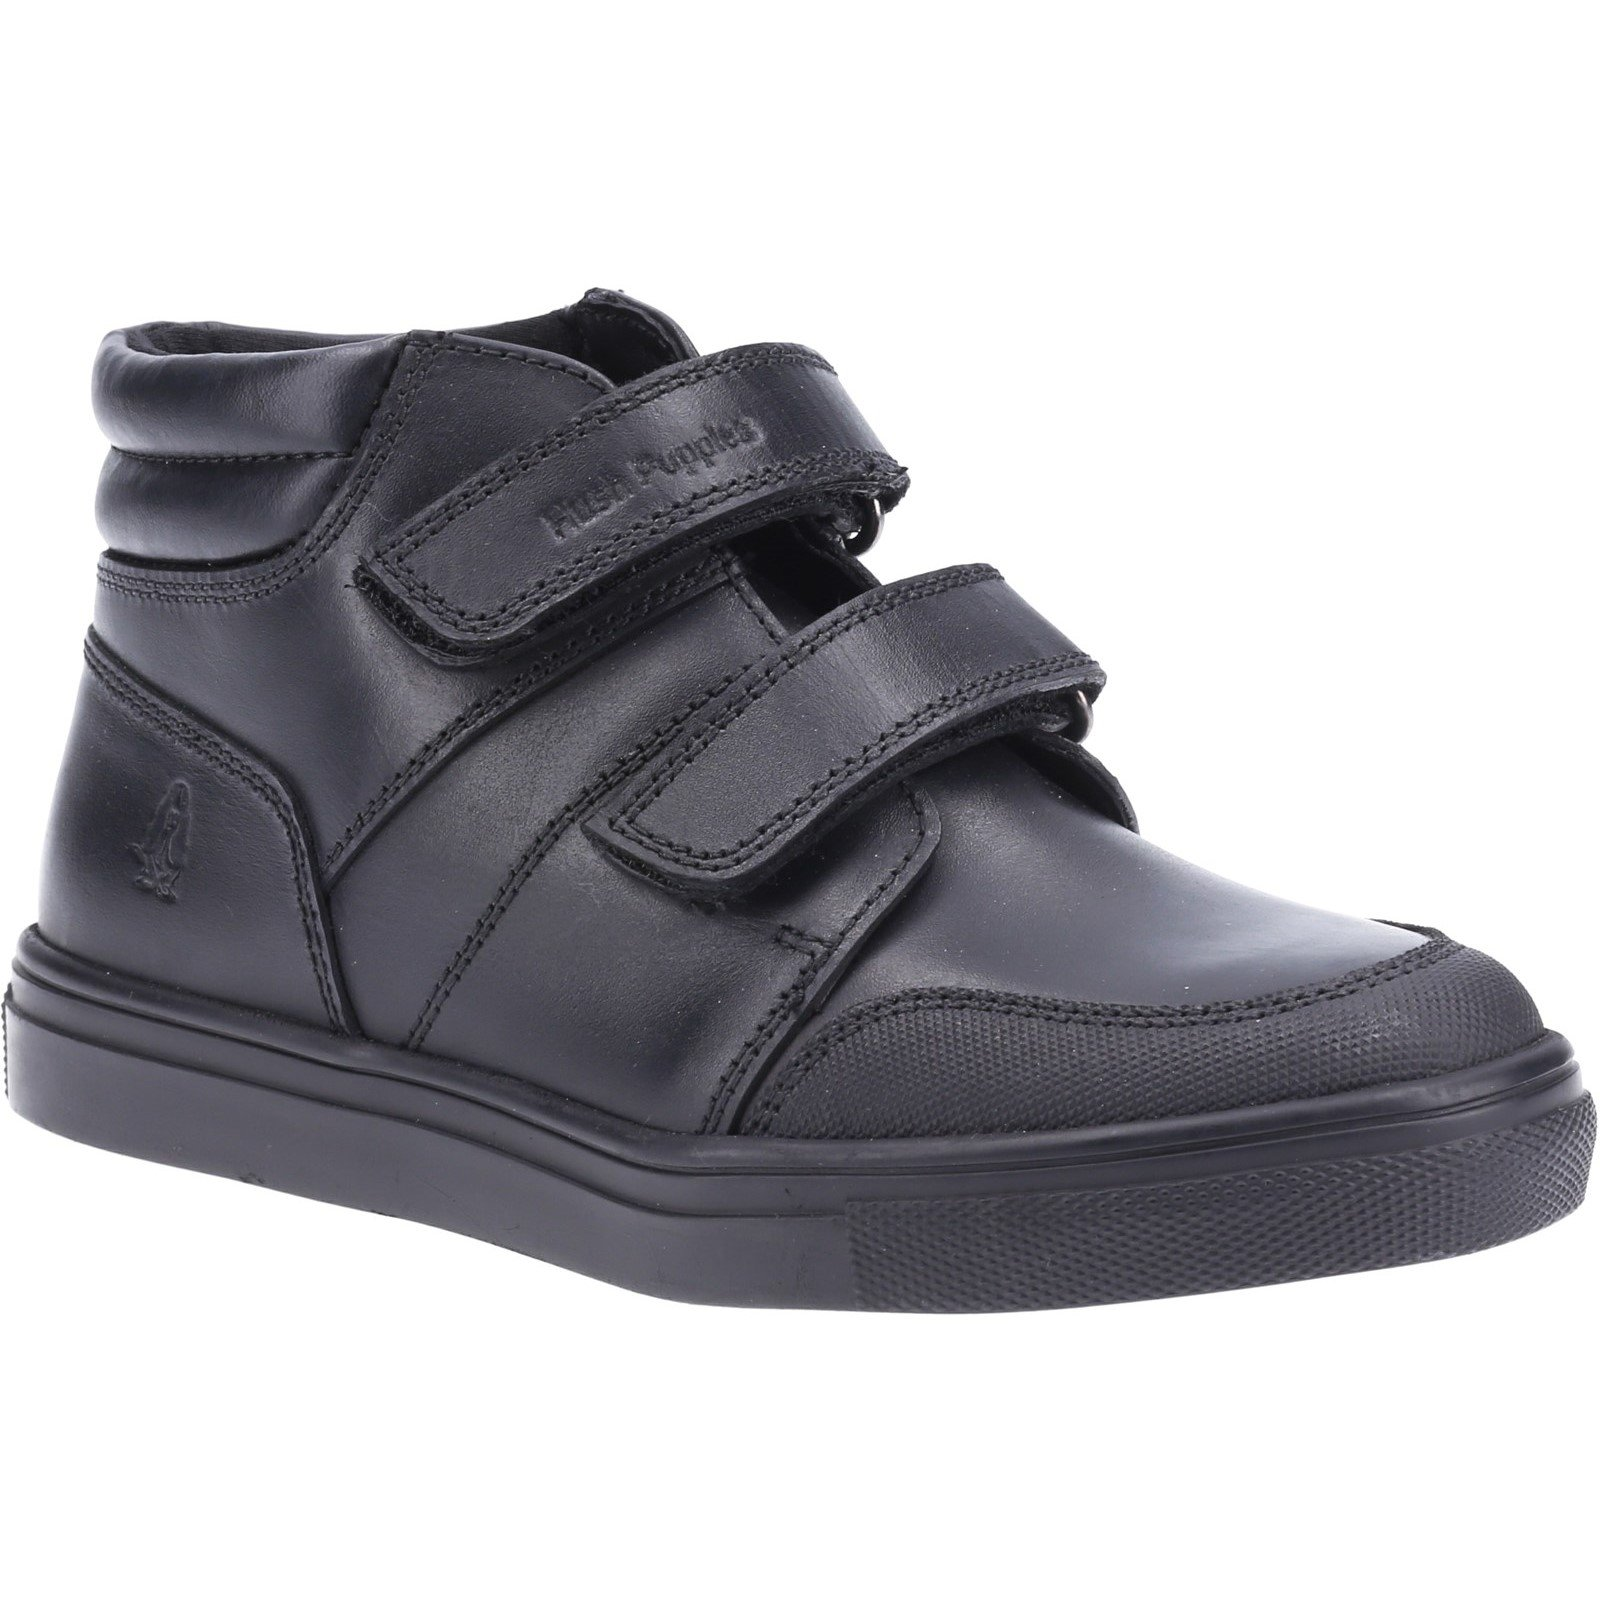 Hush Puppies Kid's Seth Senior School Boot Black 32570 - Black 6